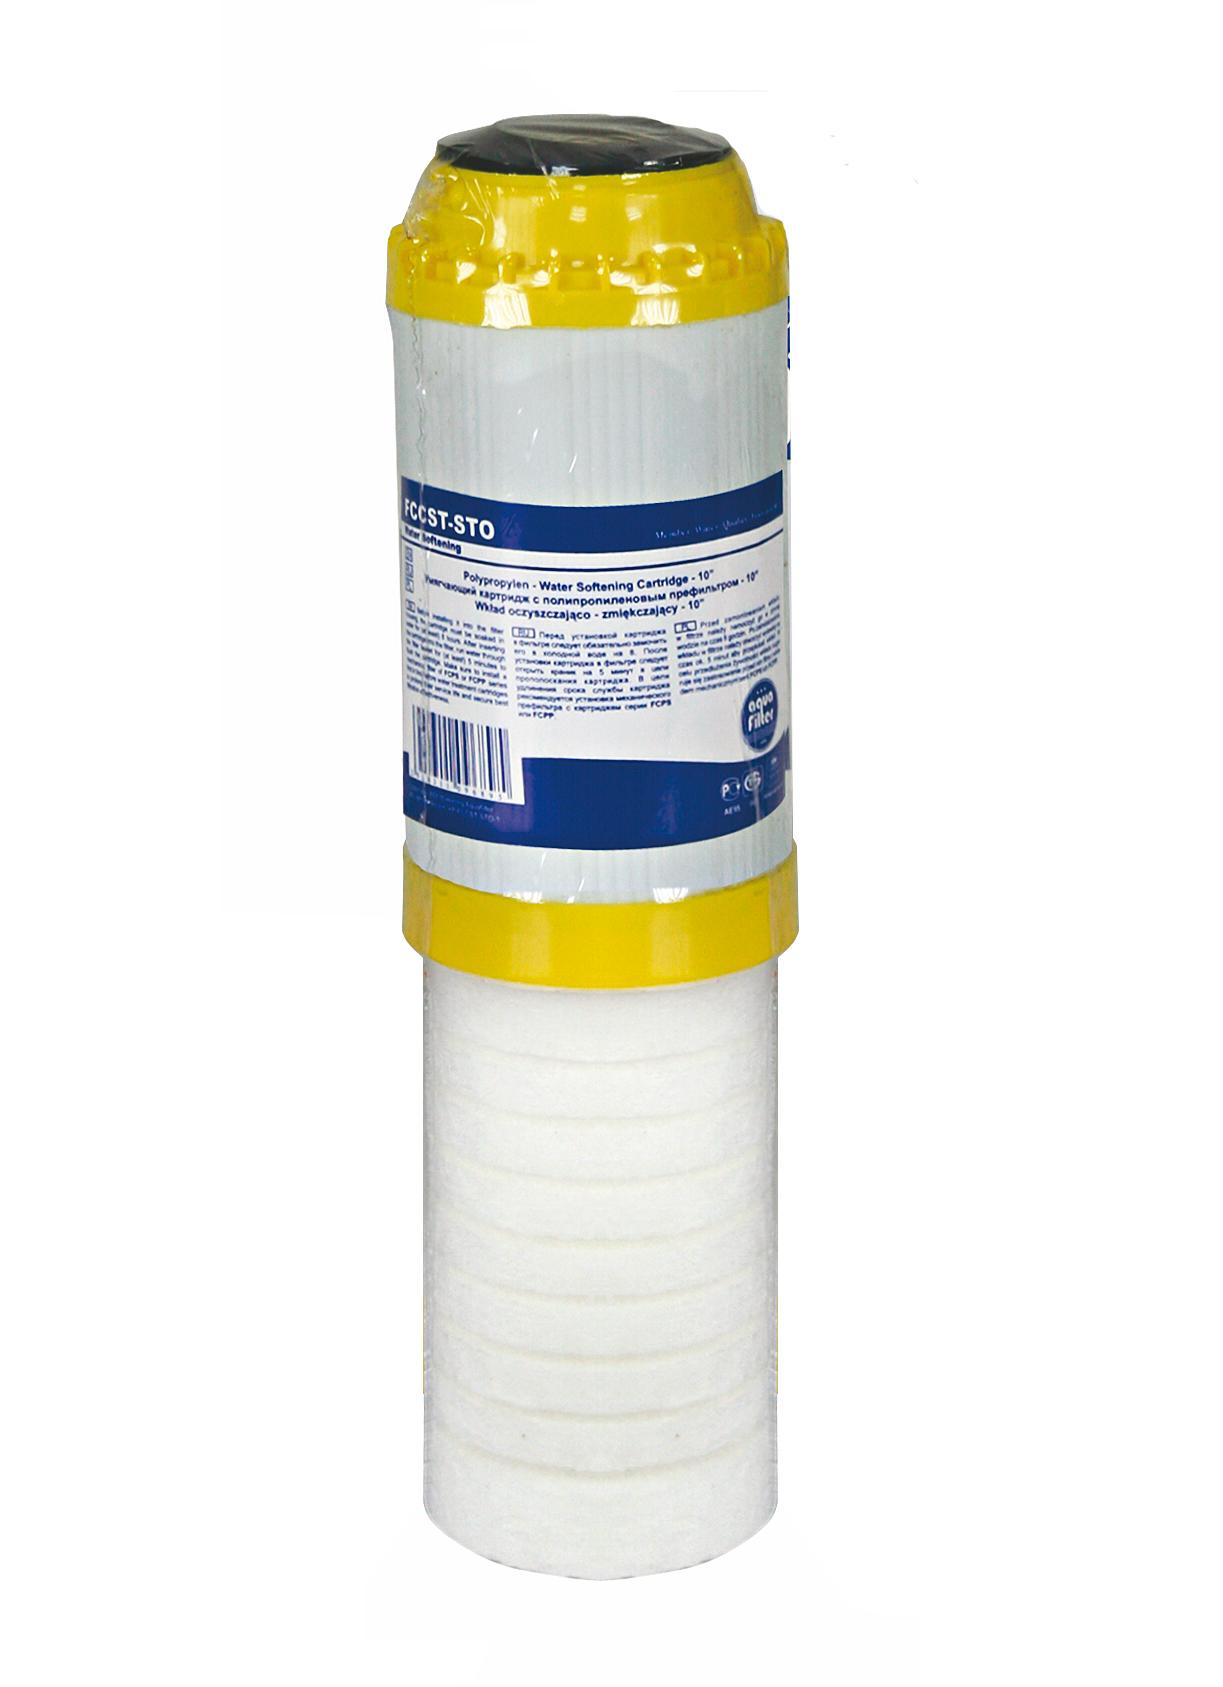 Картридж Aquafilter Fccst-sto гранулят